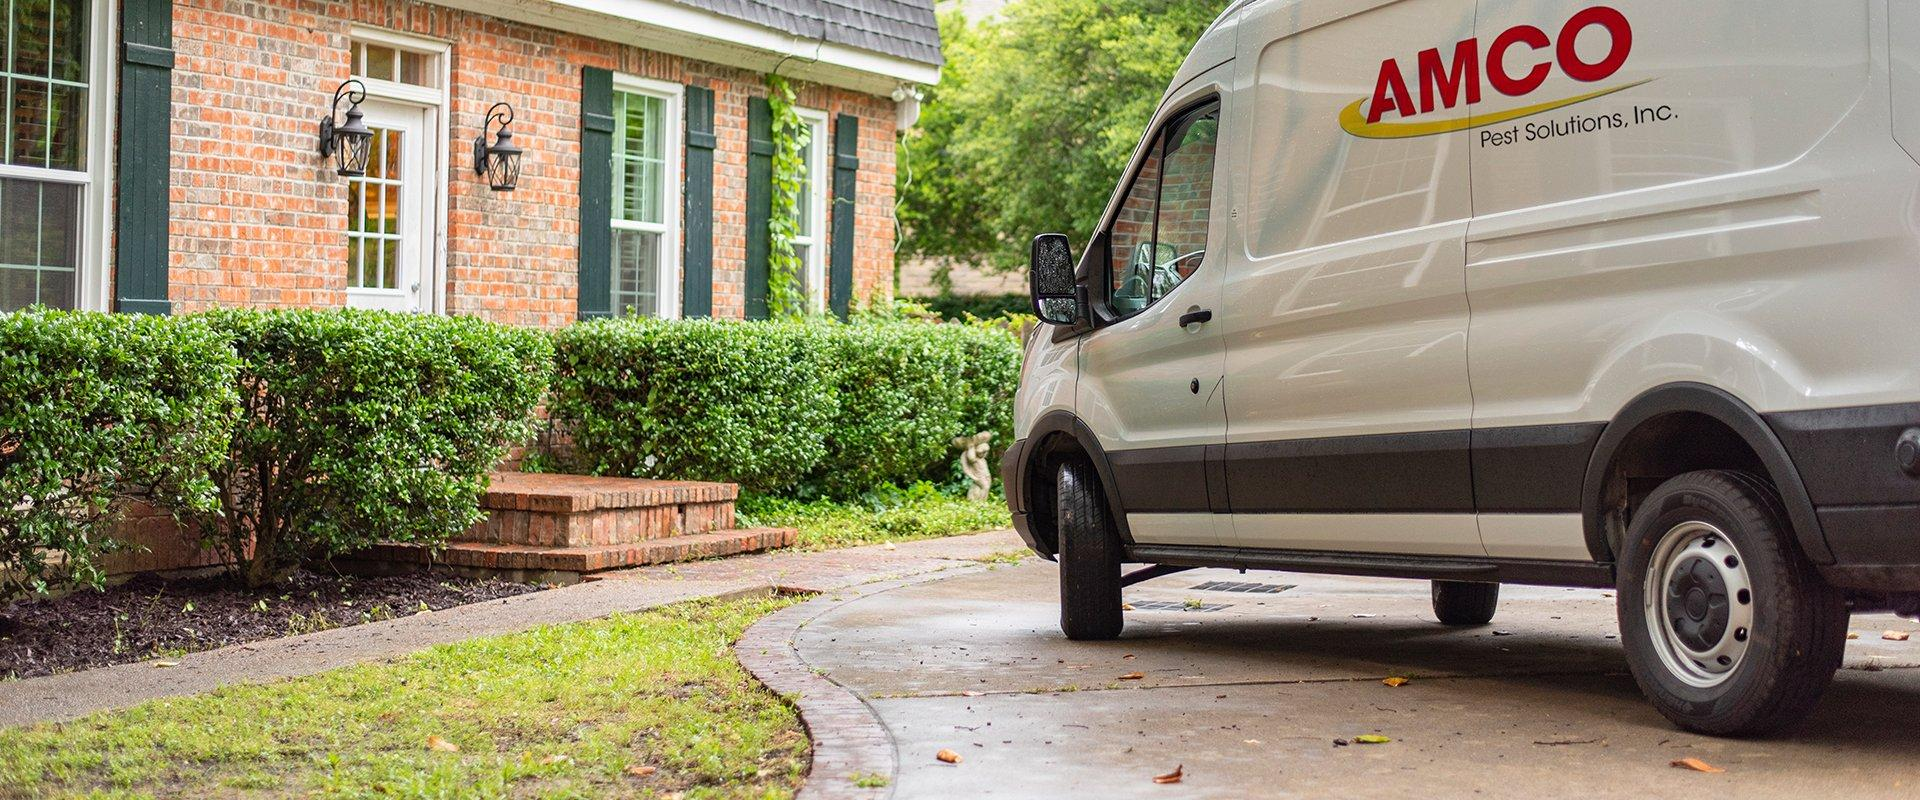 a service van outside a home